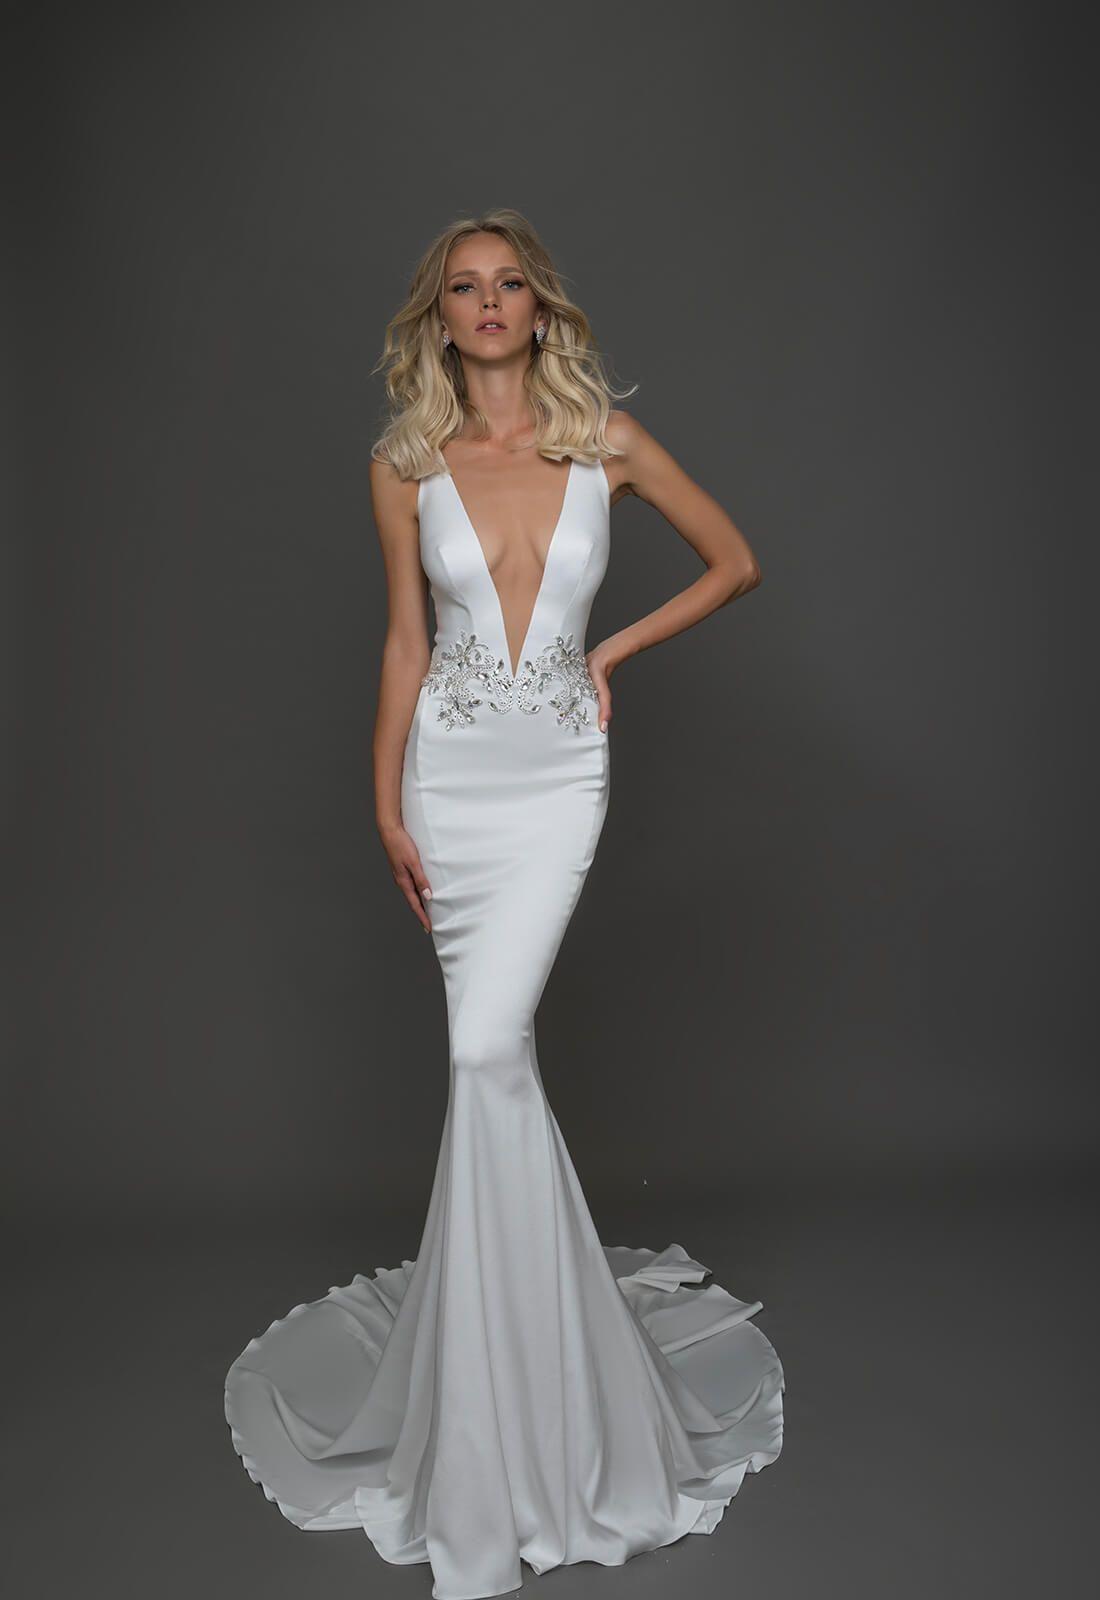 Pnina wedding dress  Style no   wedding  Pinterest  Pnina tornai Wedding dress